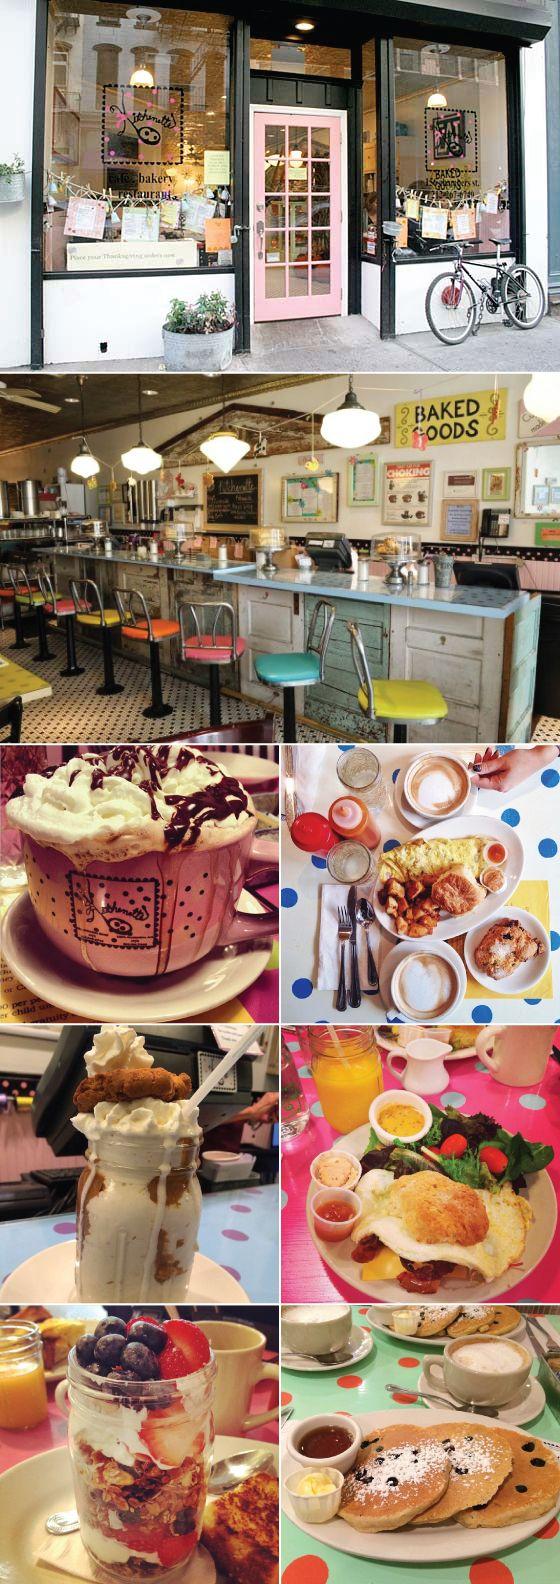 kitchenette-restaurante-ny-new-york-dica-tips-diner-fofo-travel-vintage-retro-brunch Kitchenette $$   156 Chambers St. entre a Hudson St & Greenwich St em TriBeCa (Também tem em Uptown, na 1272 Amsterdam Ave com a 123rd St.).